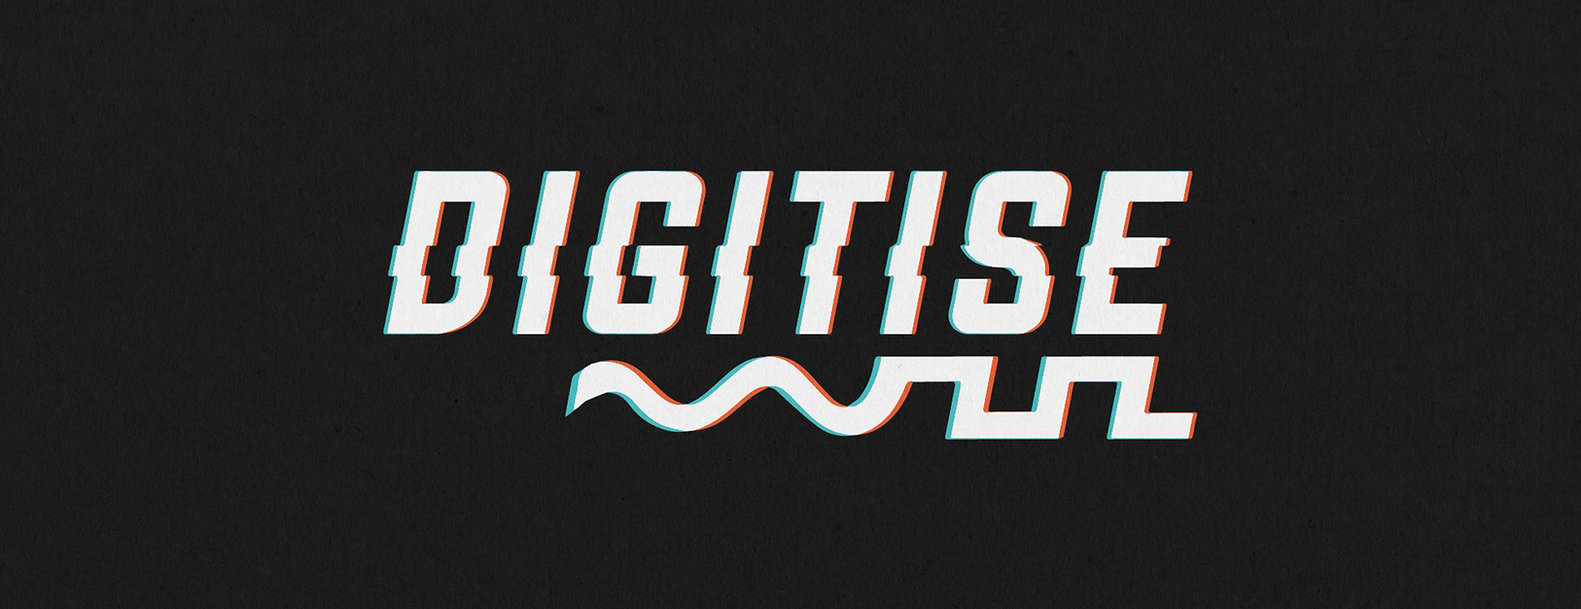 logo mockup2.jpg